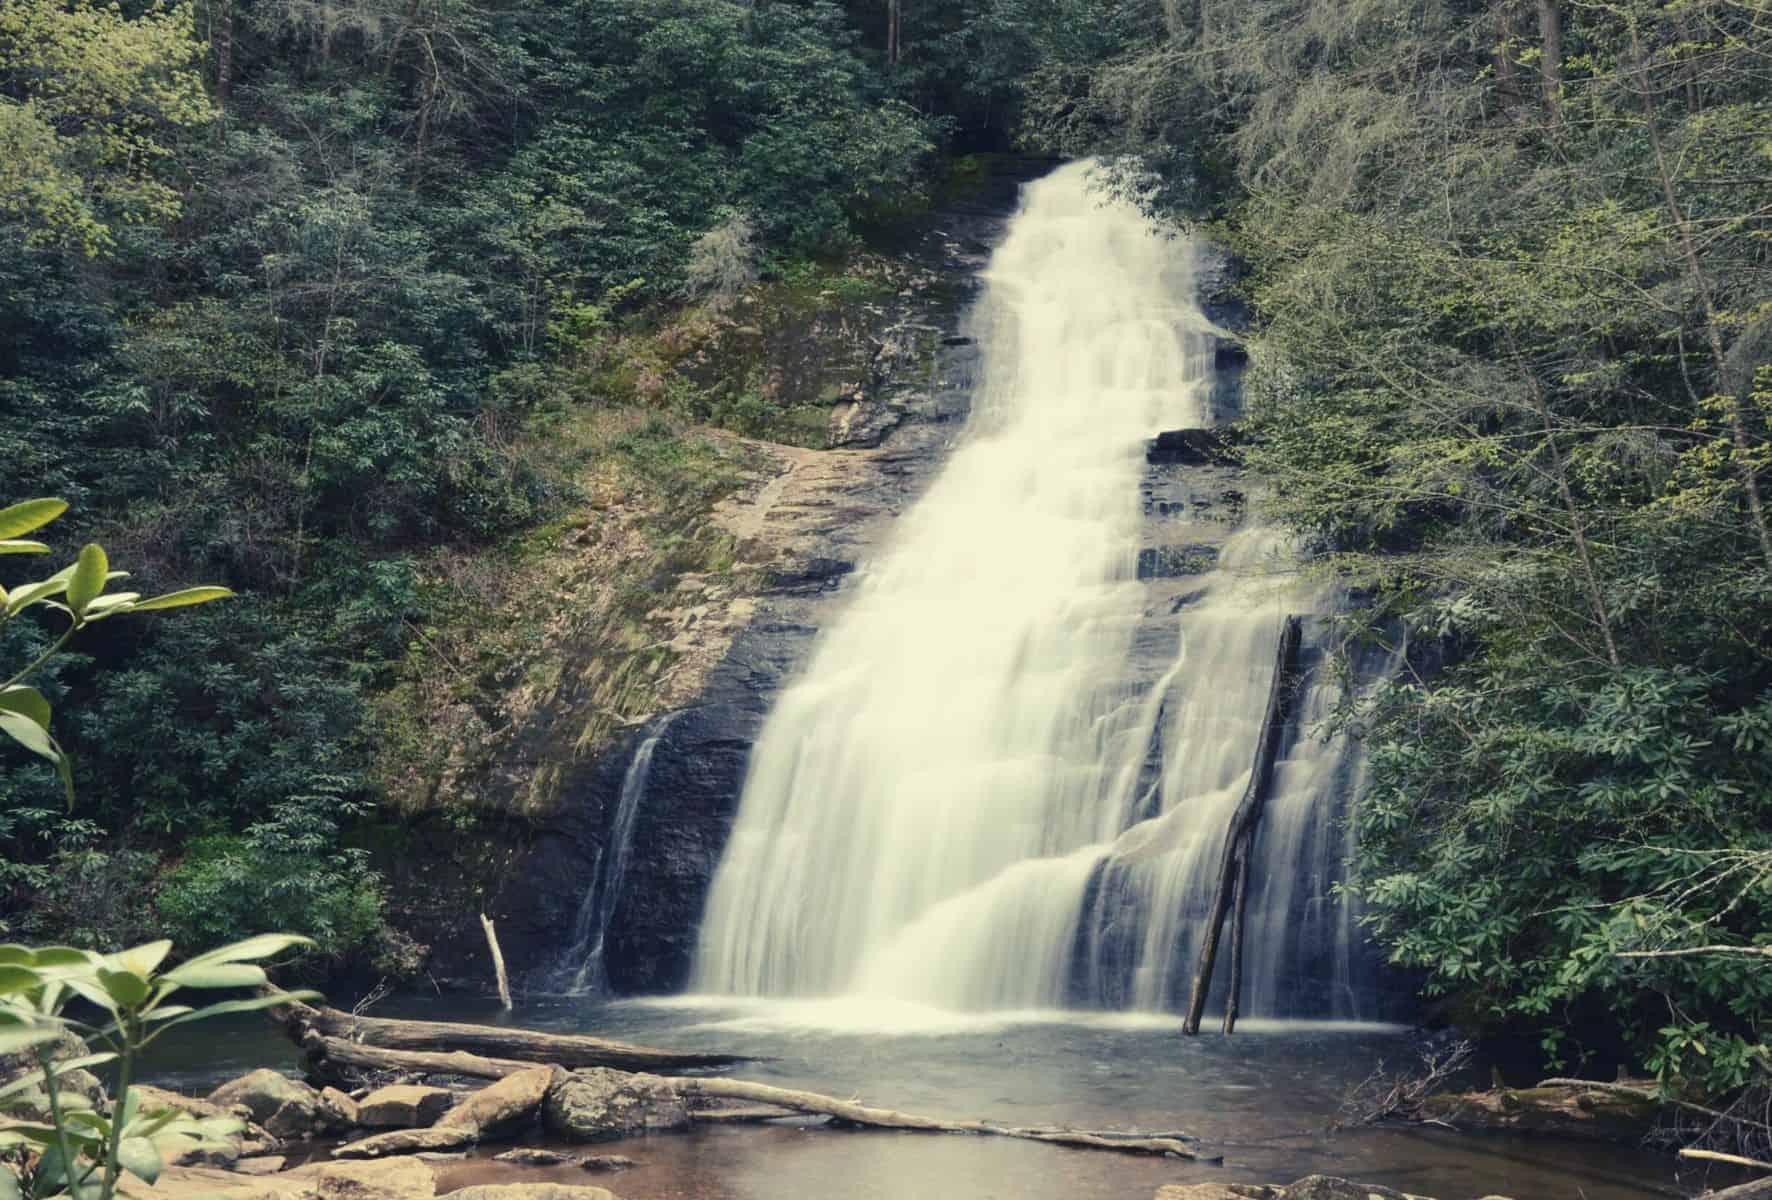 helton creek falls trip review featimage